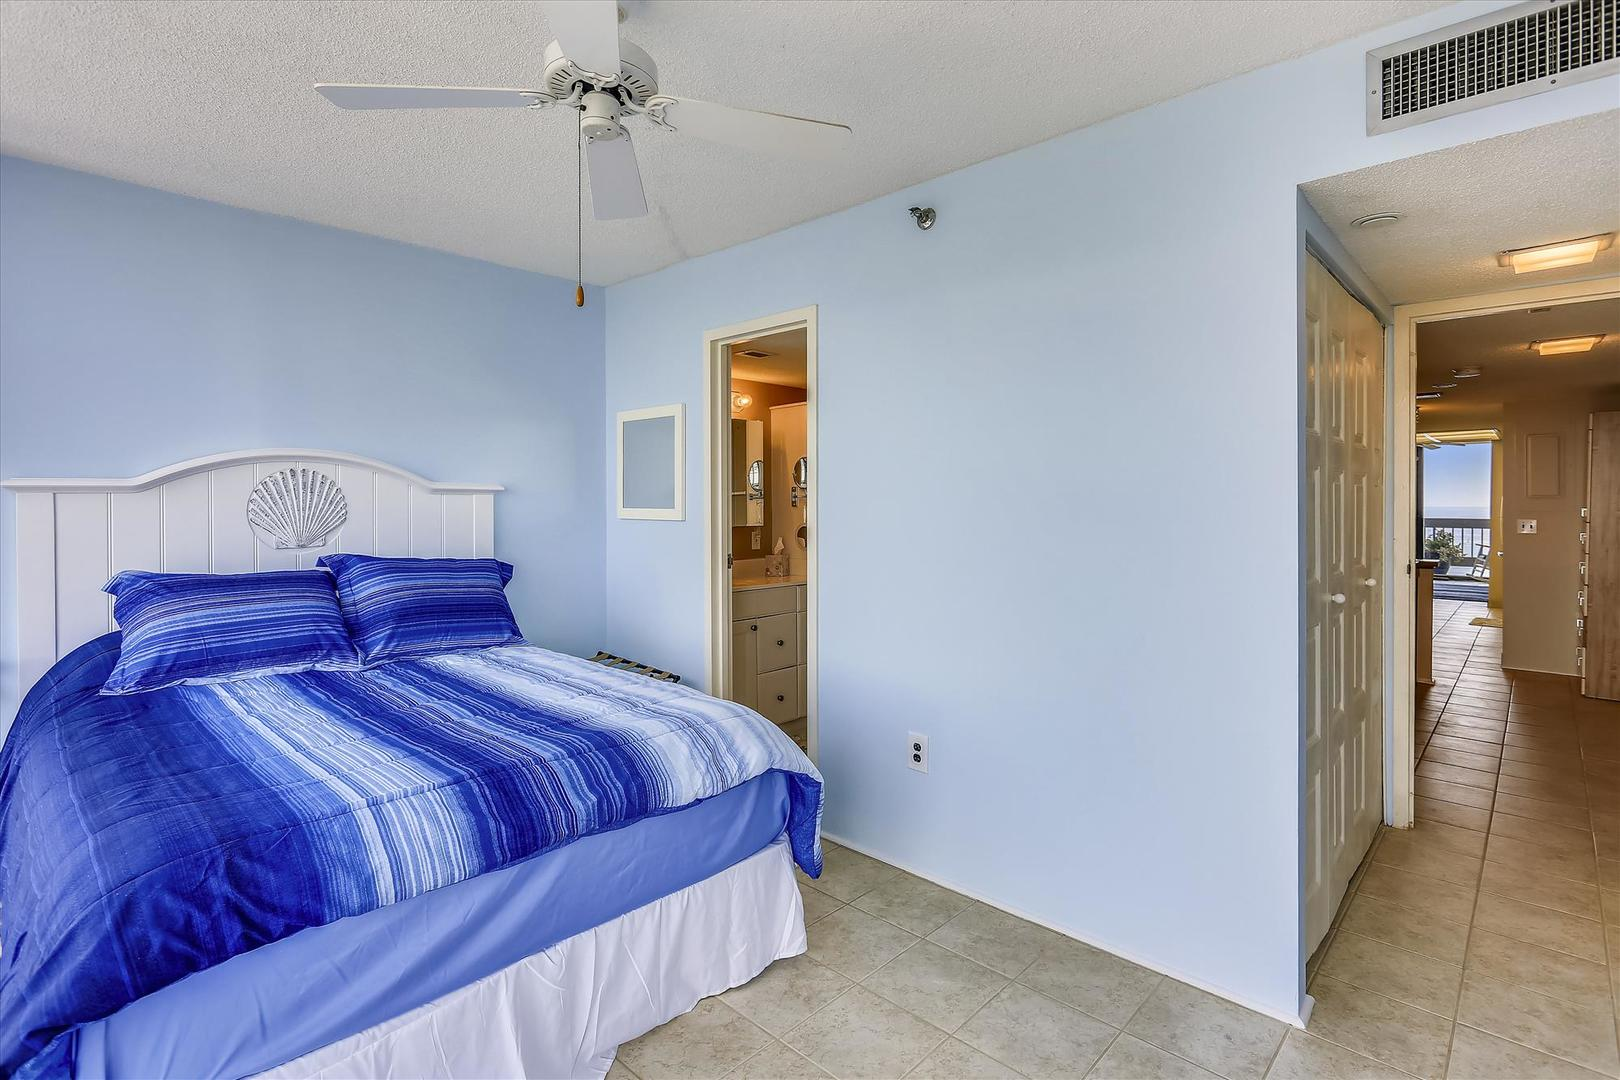 Century I 2221 - Upper Level Bedroom